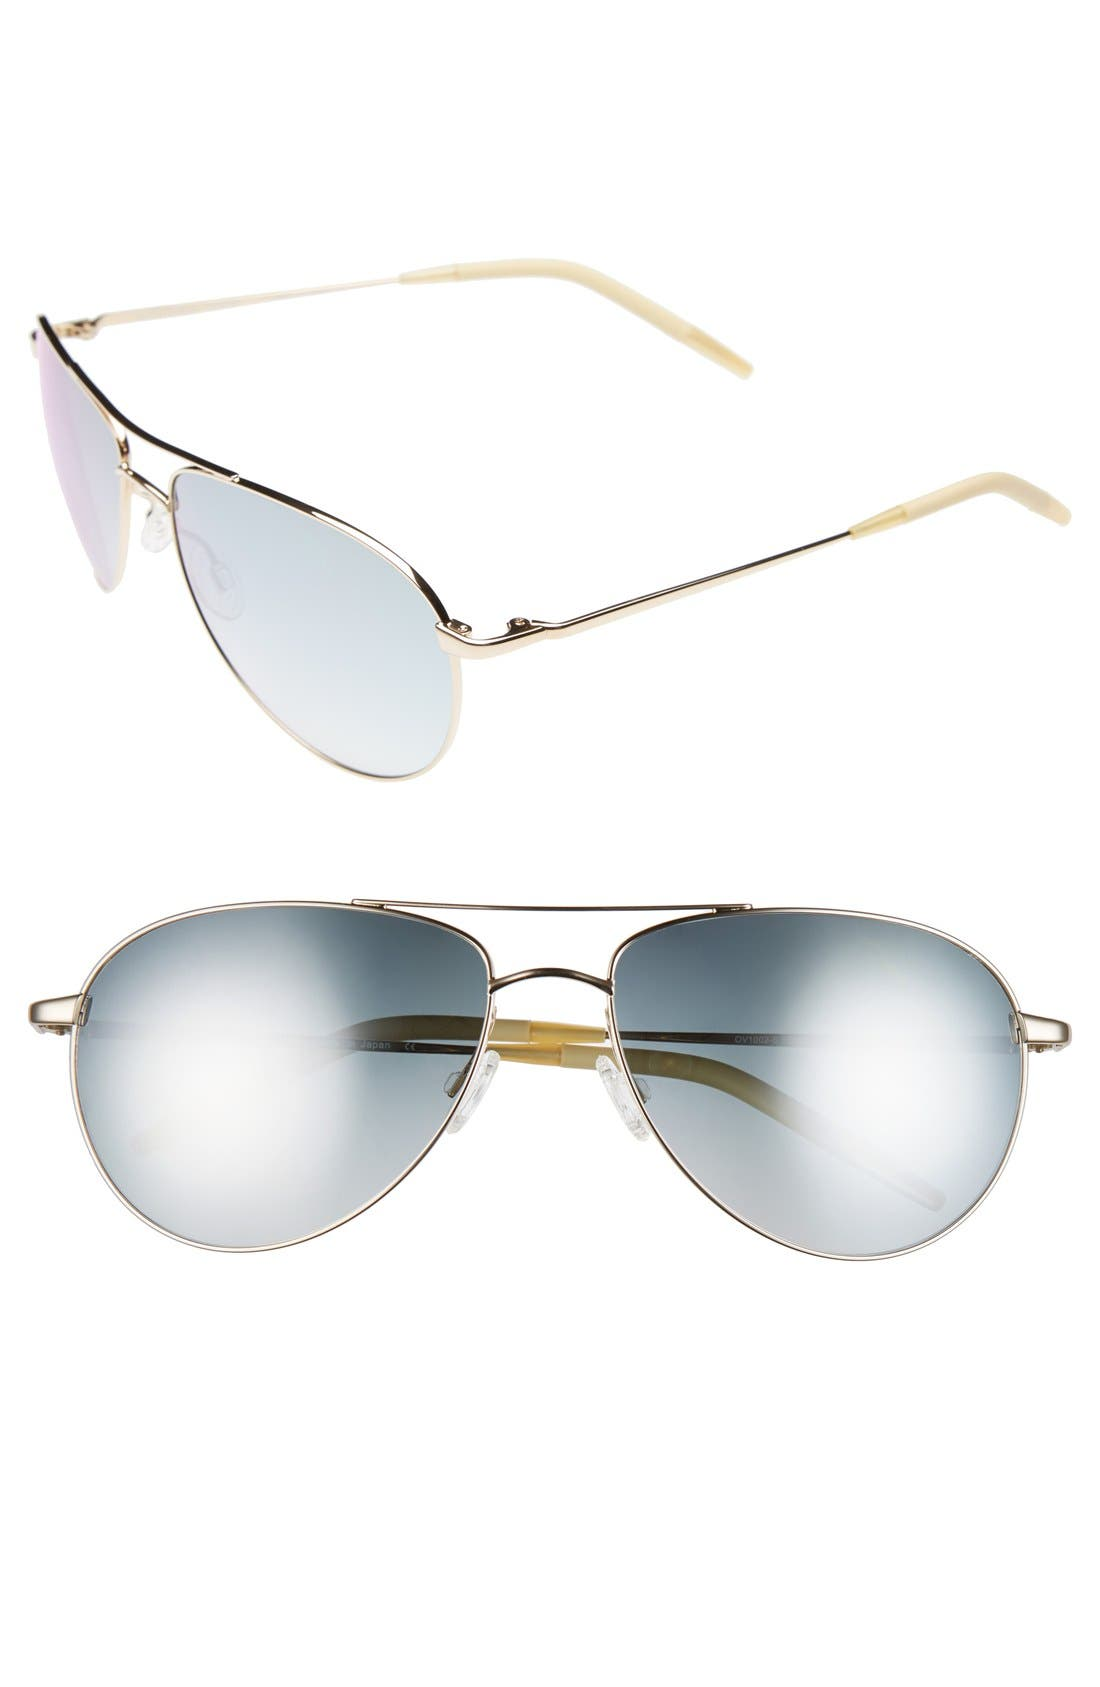 Main Image - Oliver Peoples 'Benedict' 59mm Aviator Sunglasses